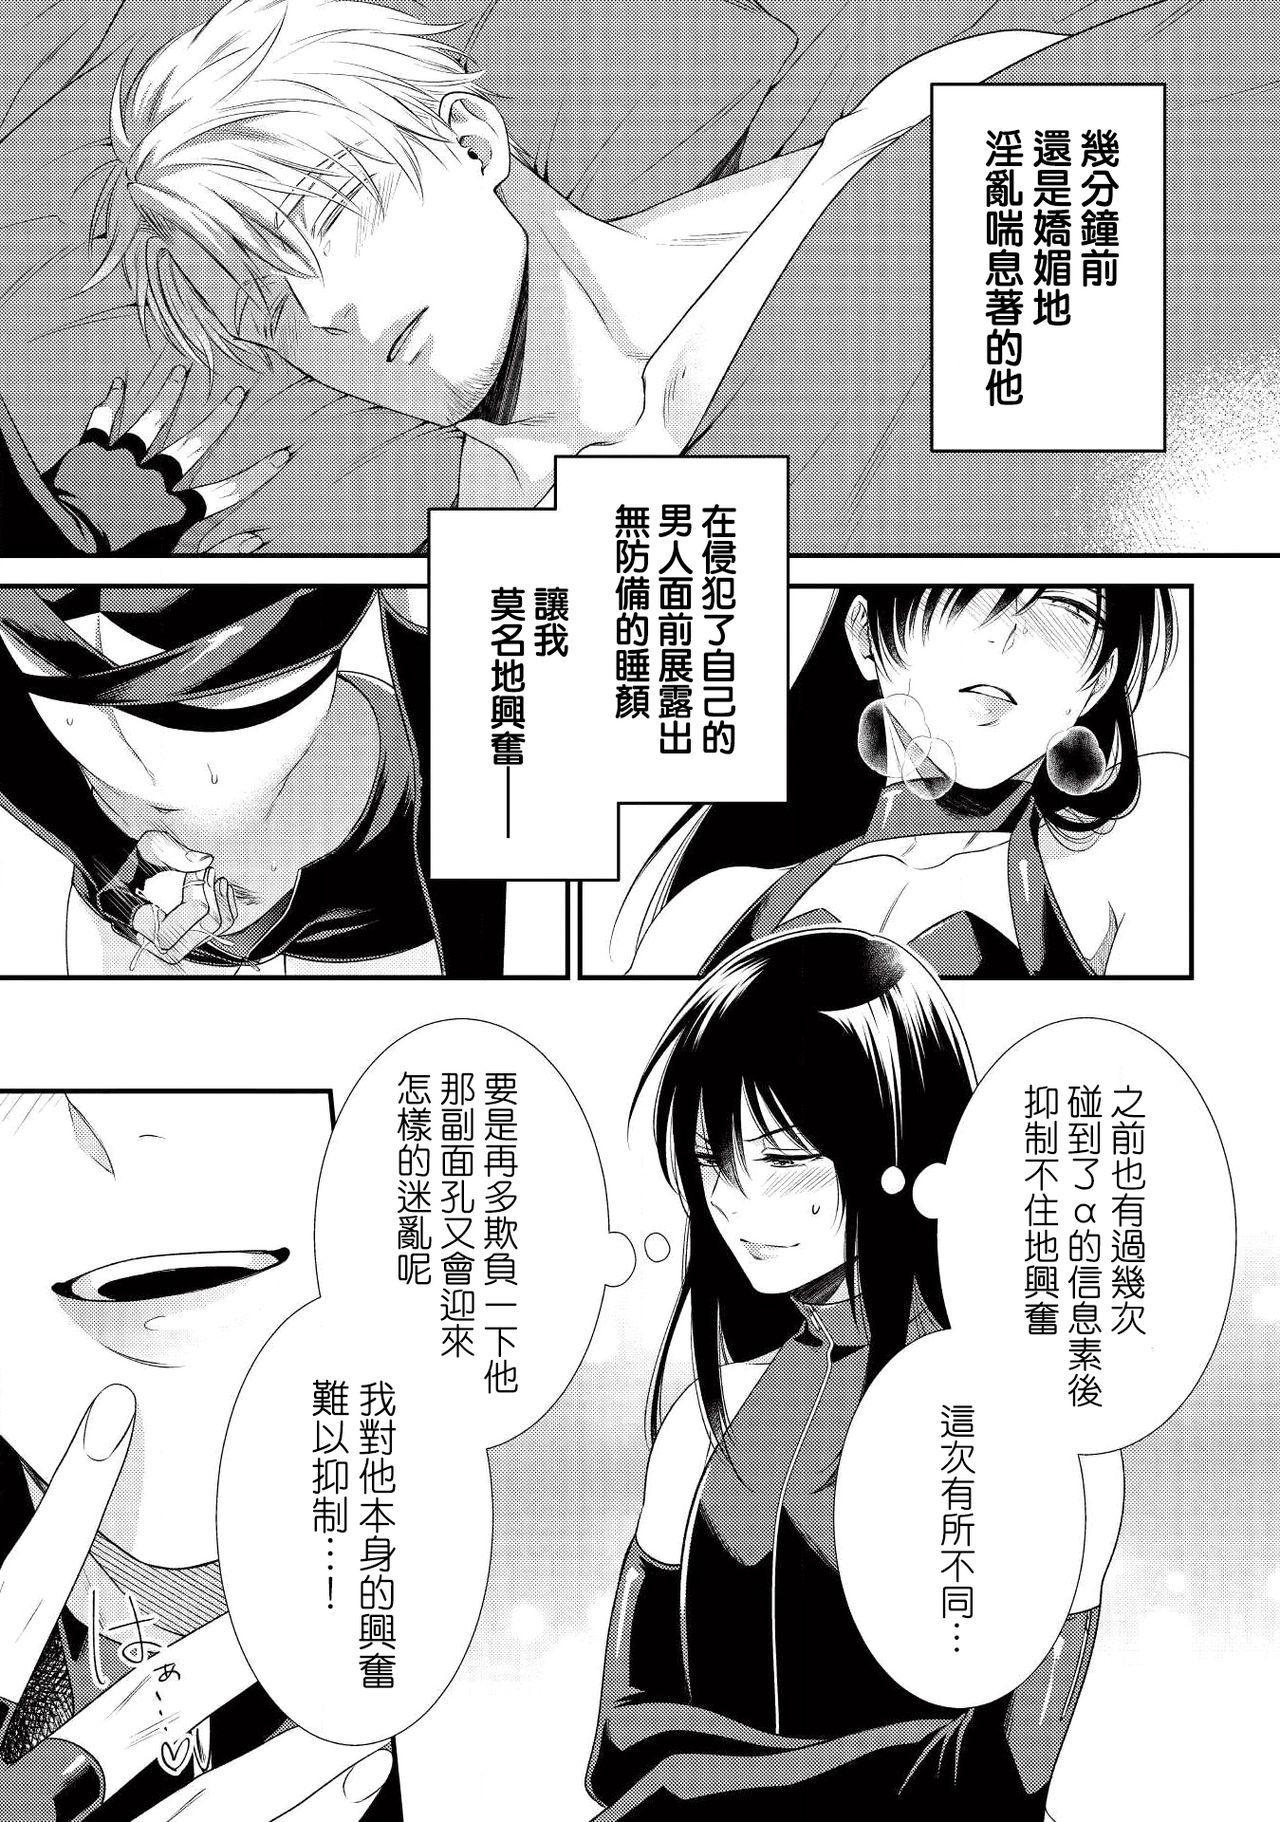 [Aion Kiu] Ijimete Kudasai Omega-sama ch.1-2 [Chinese] [沒有漢化] [Digital] 39